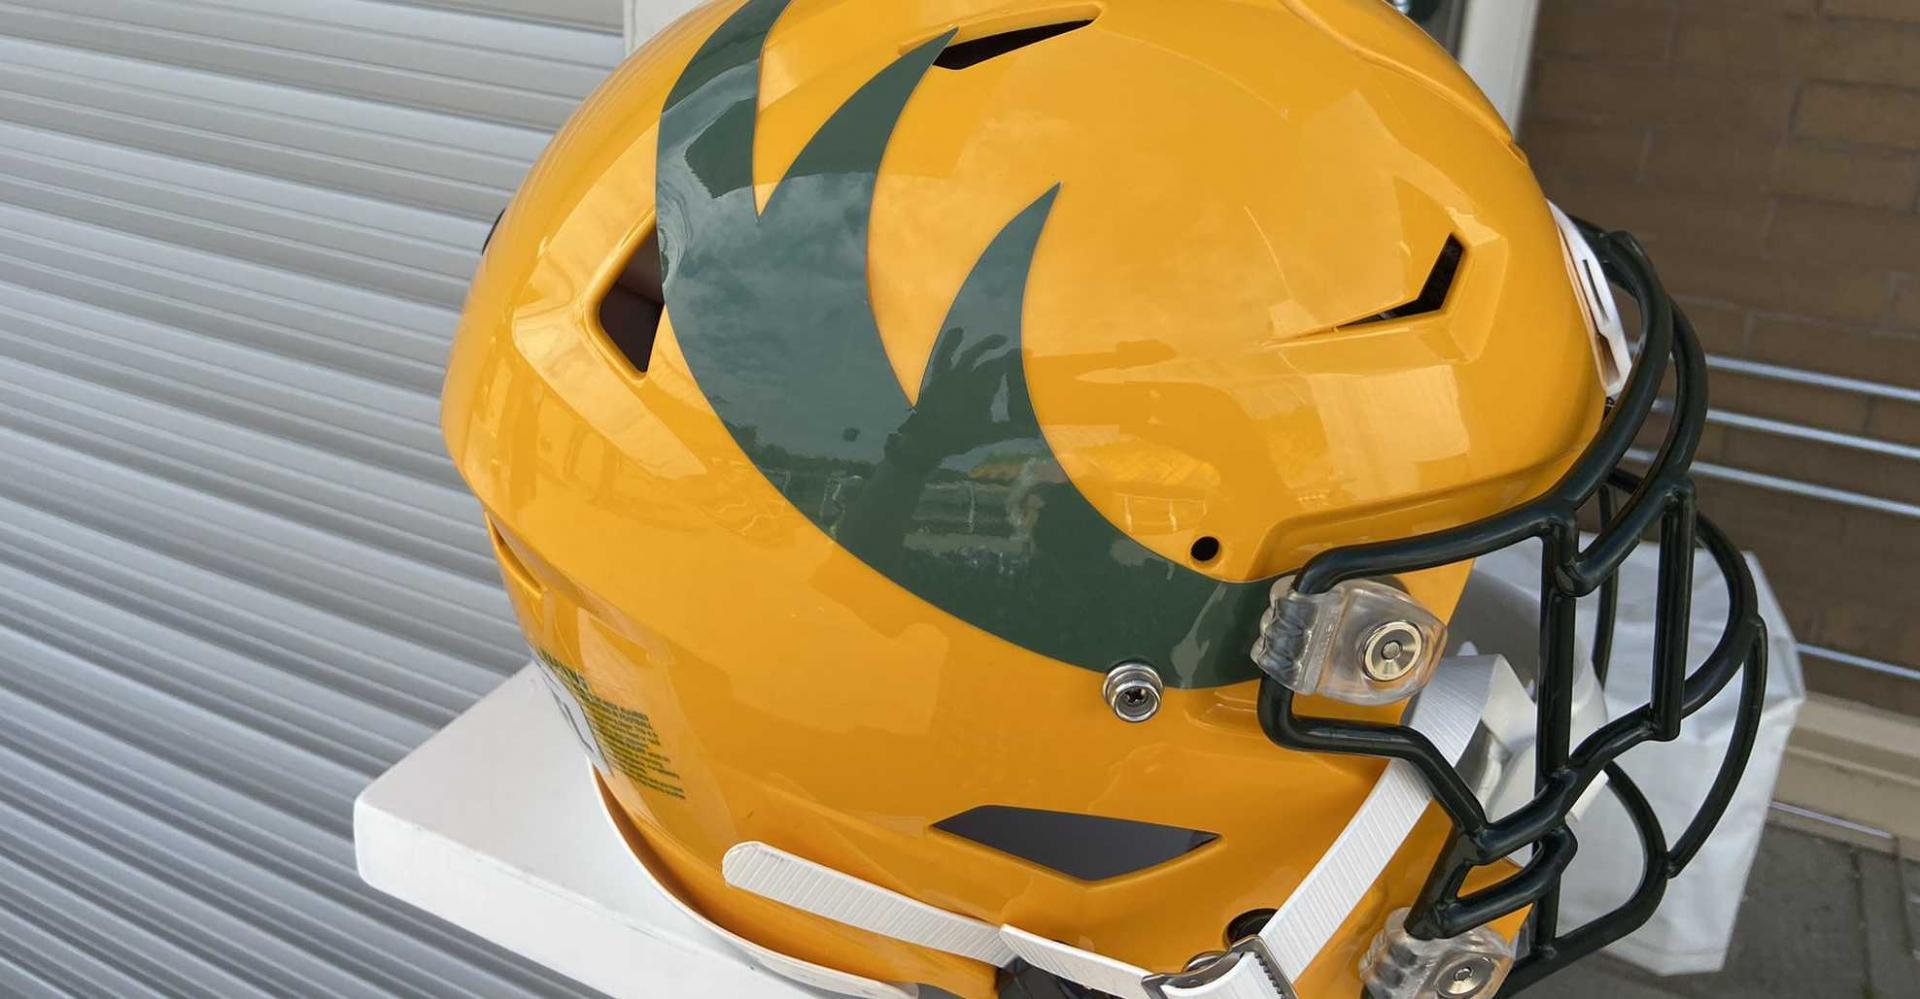 Elks-Helmet-e1622568031417